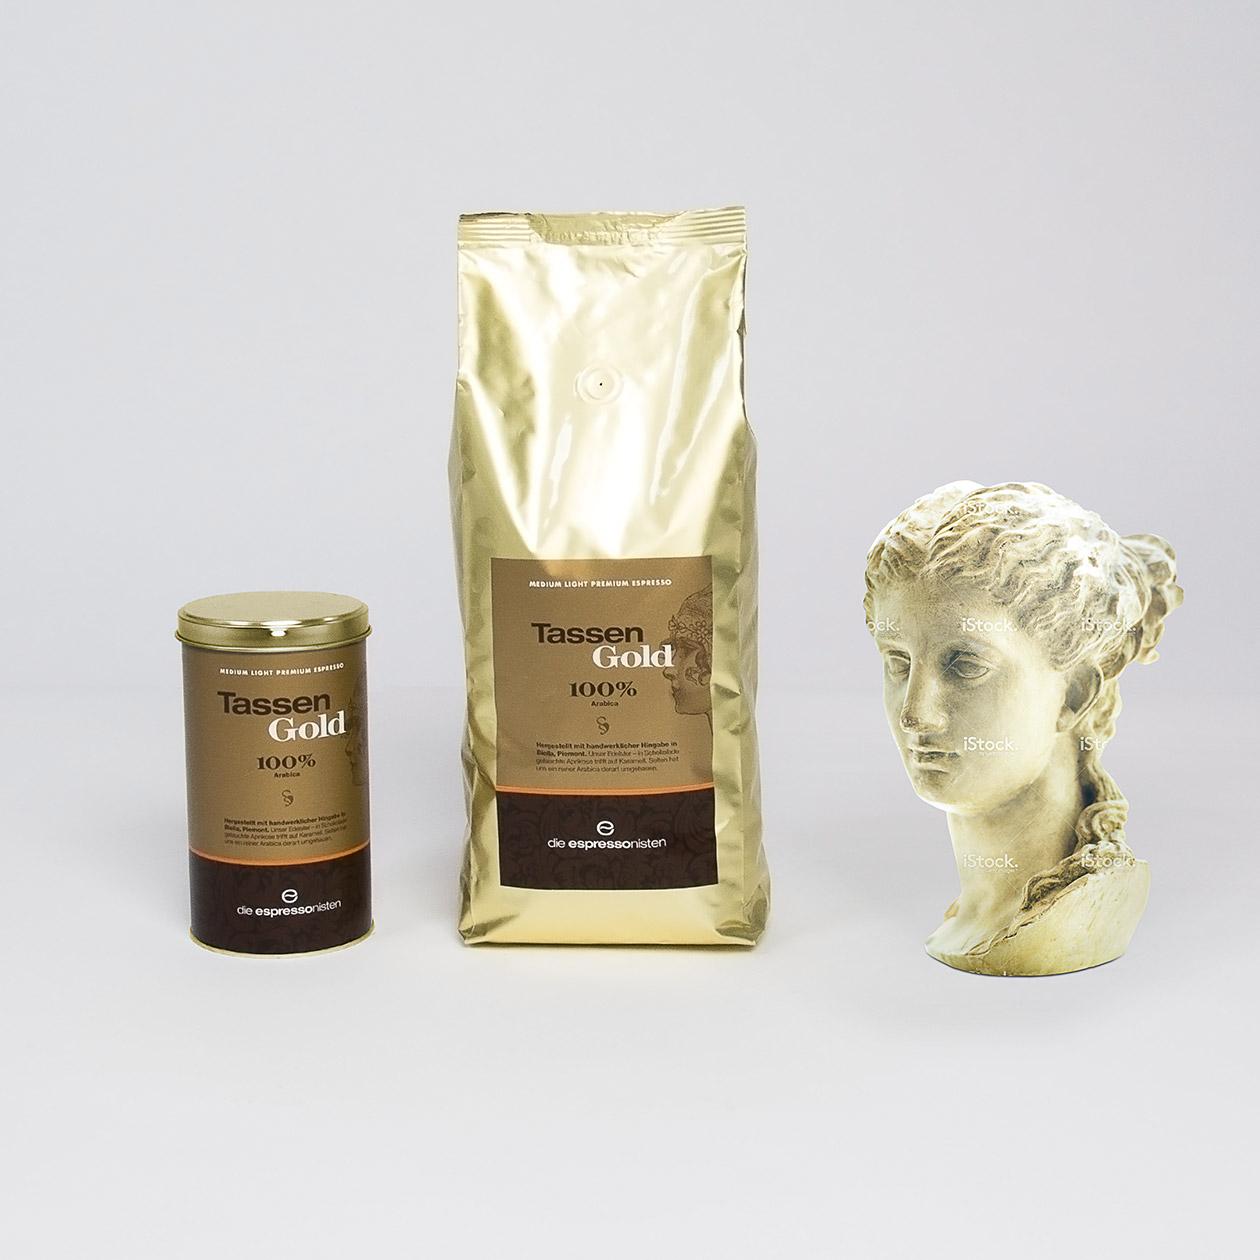 Tassengold Skulptur